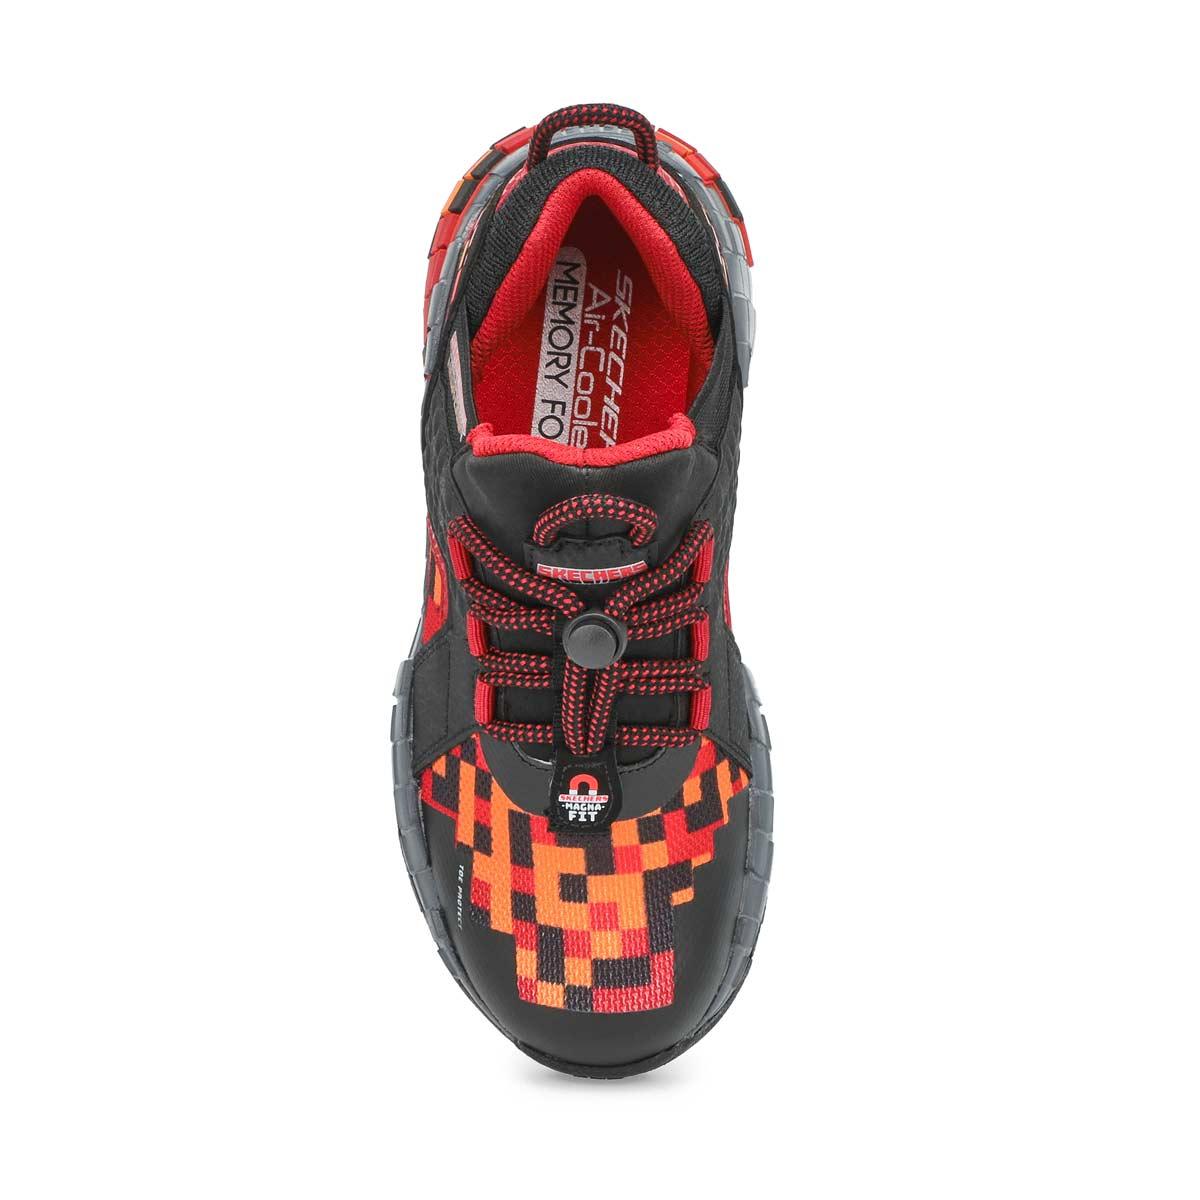 Boys' Mega-Craft Cubzone Sneaker - Black/Red